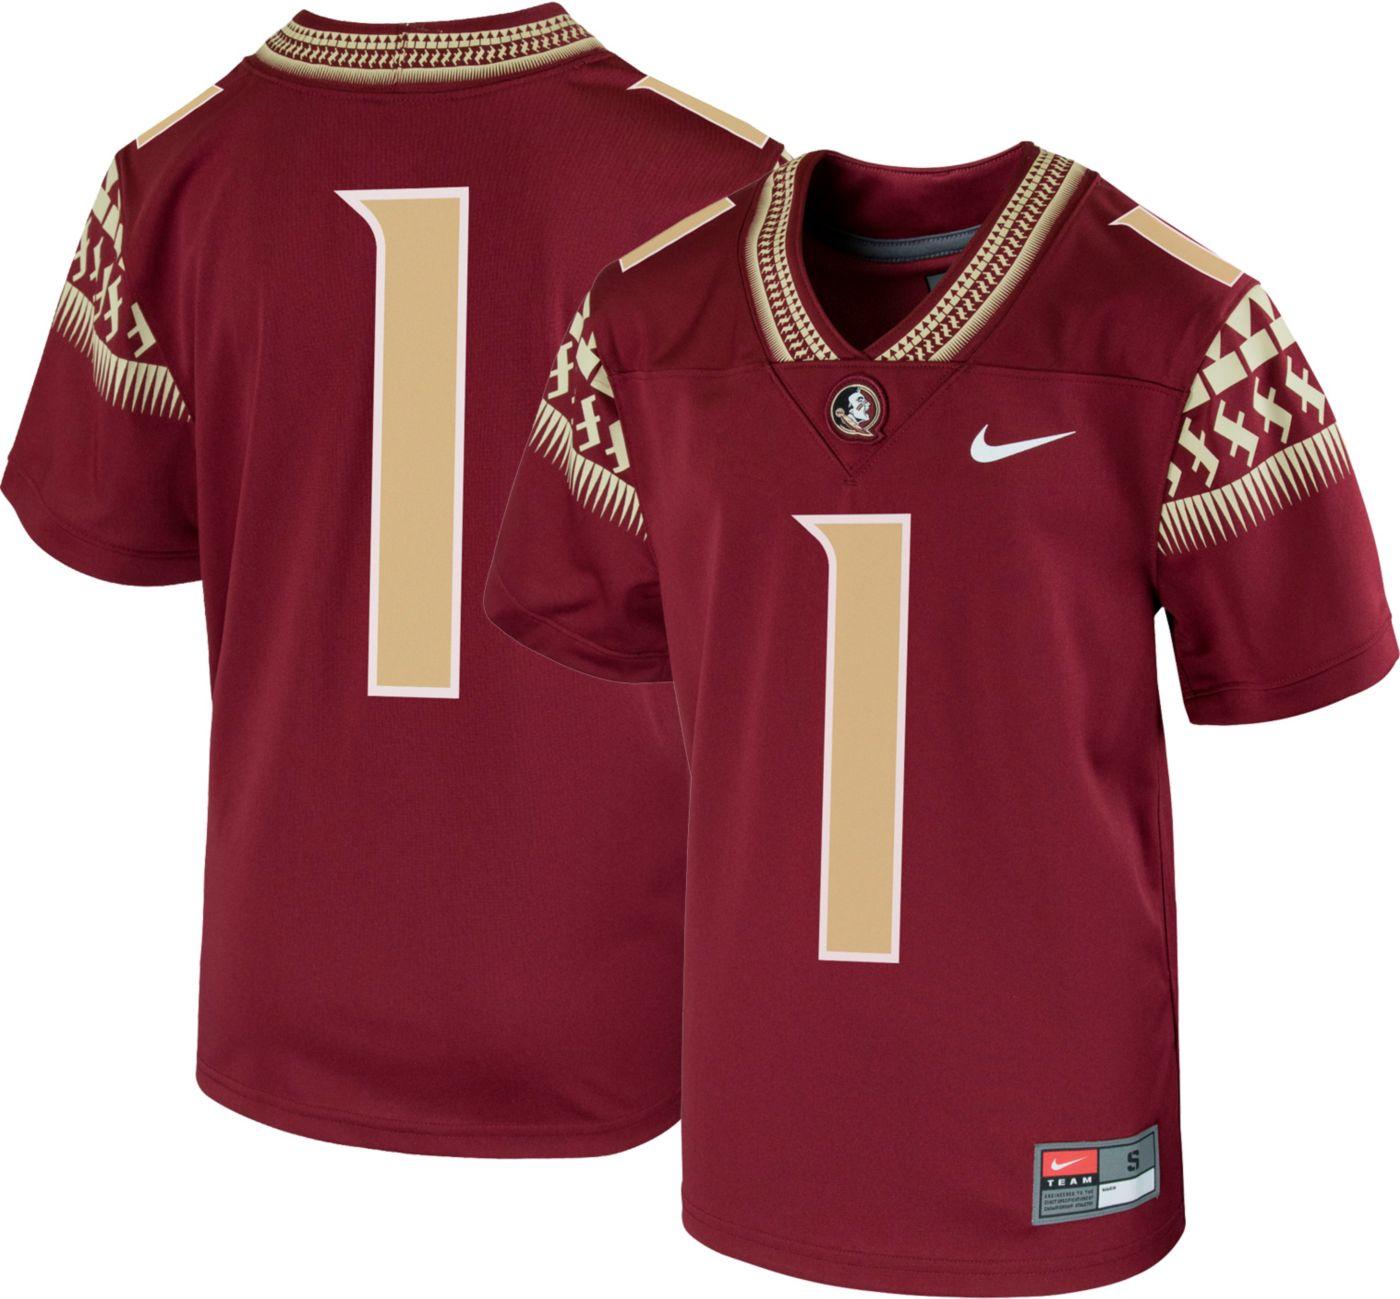 Nike Boys' Florida State Seminoles #1 Garnet Replica Football Jersey